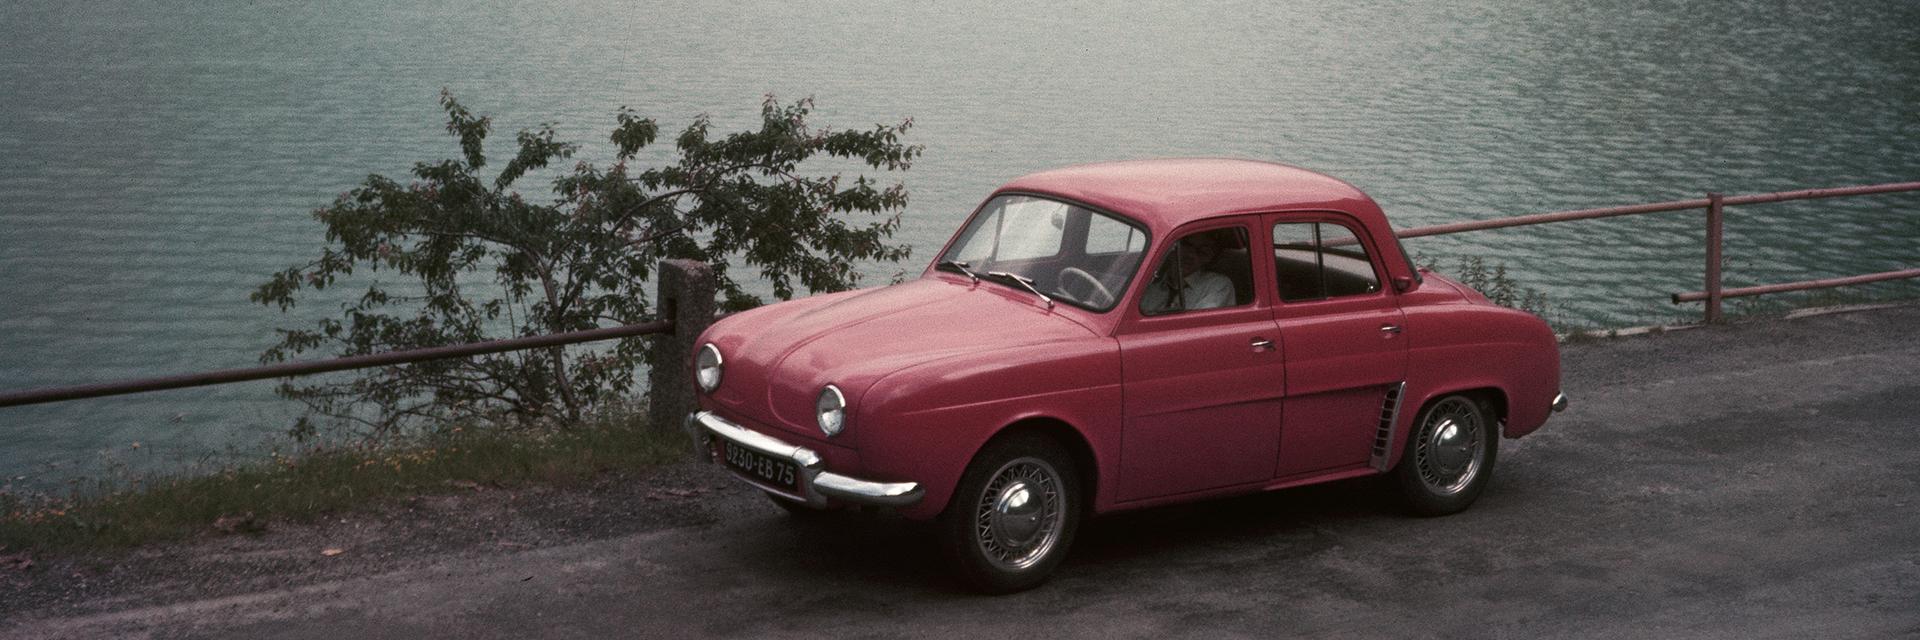 Renault Garantie -bytesbilar